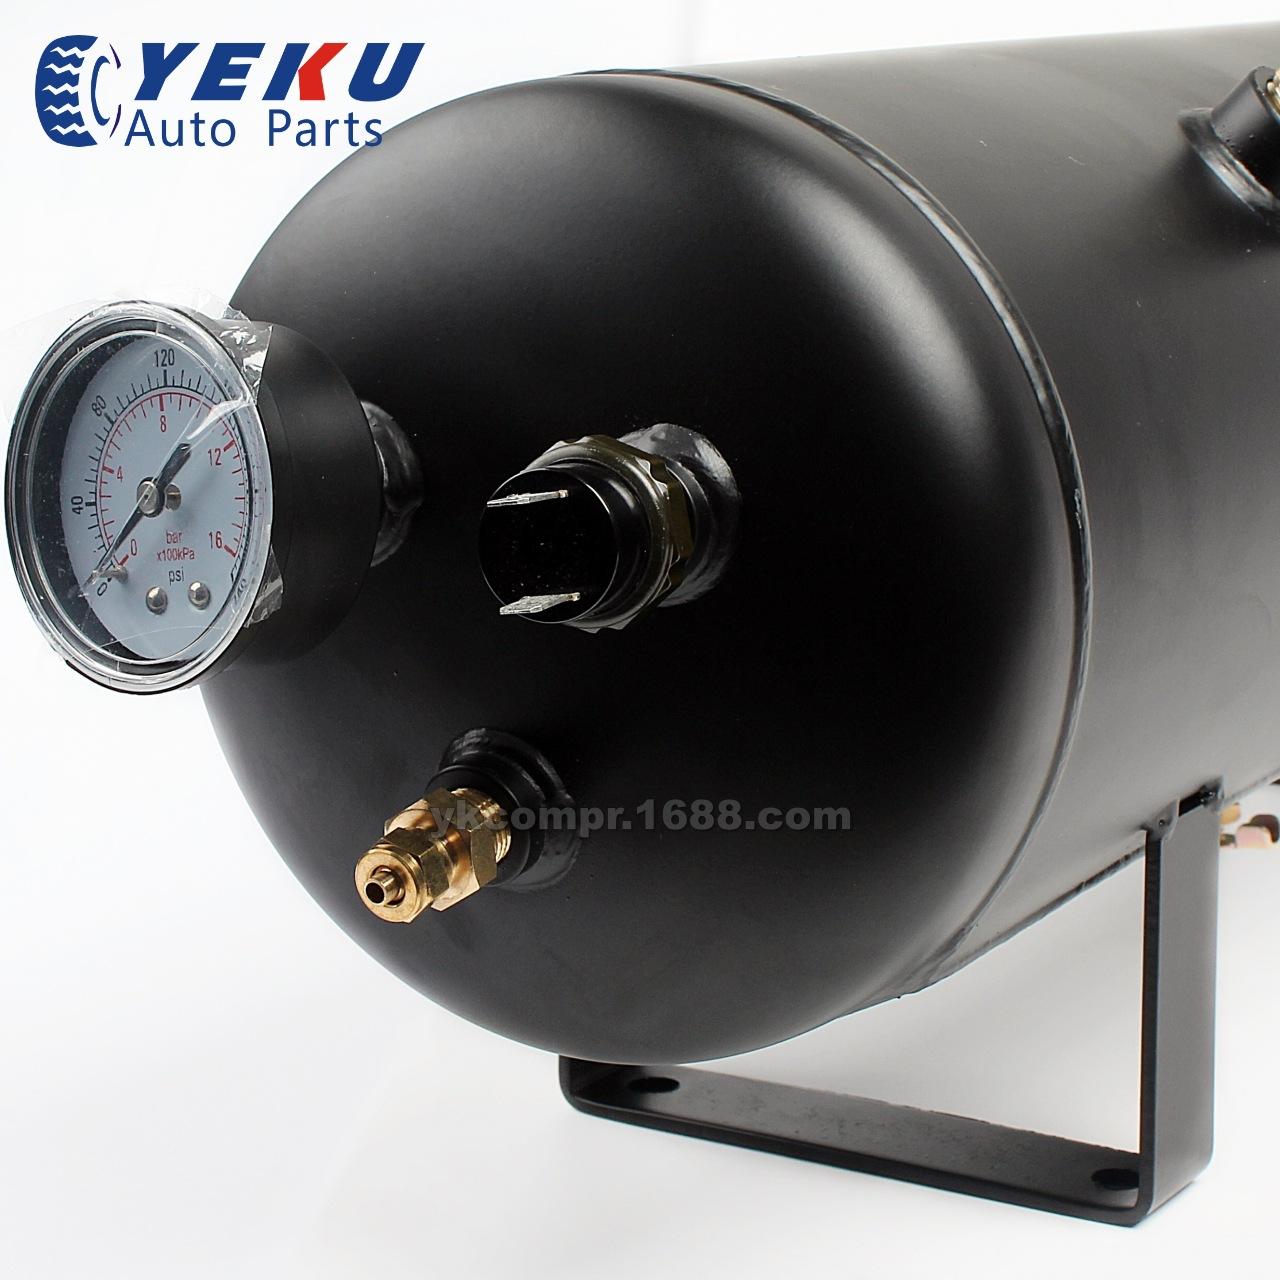 12V200PSI车载气泵高流量高性能改装气泵